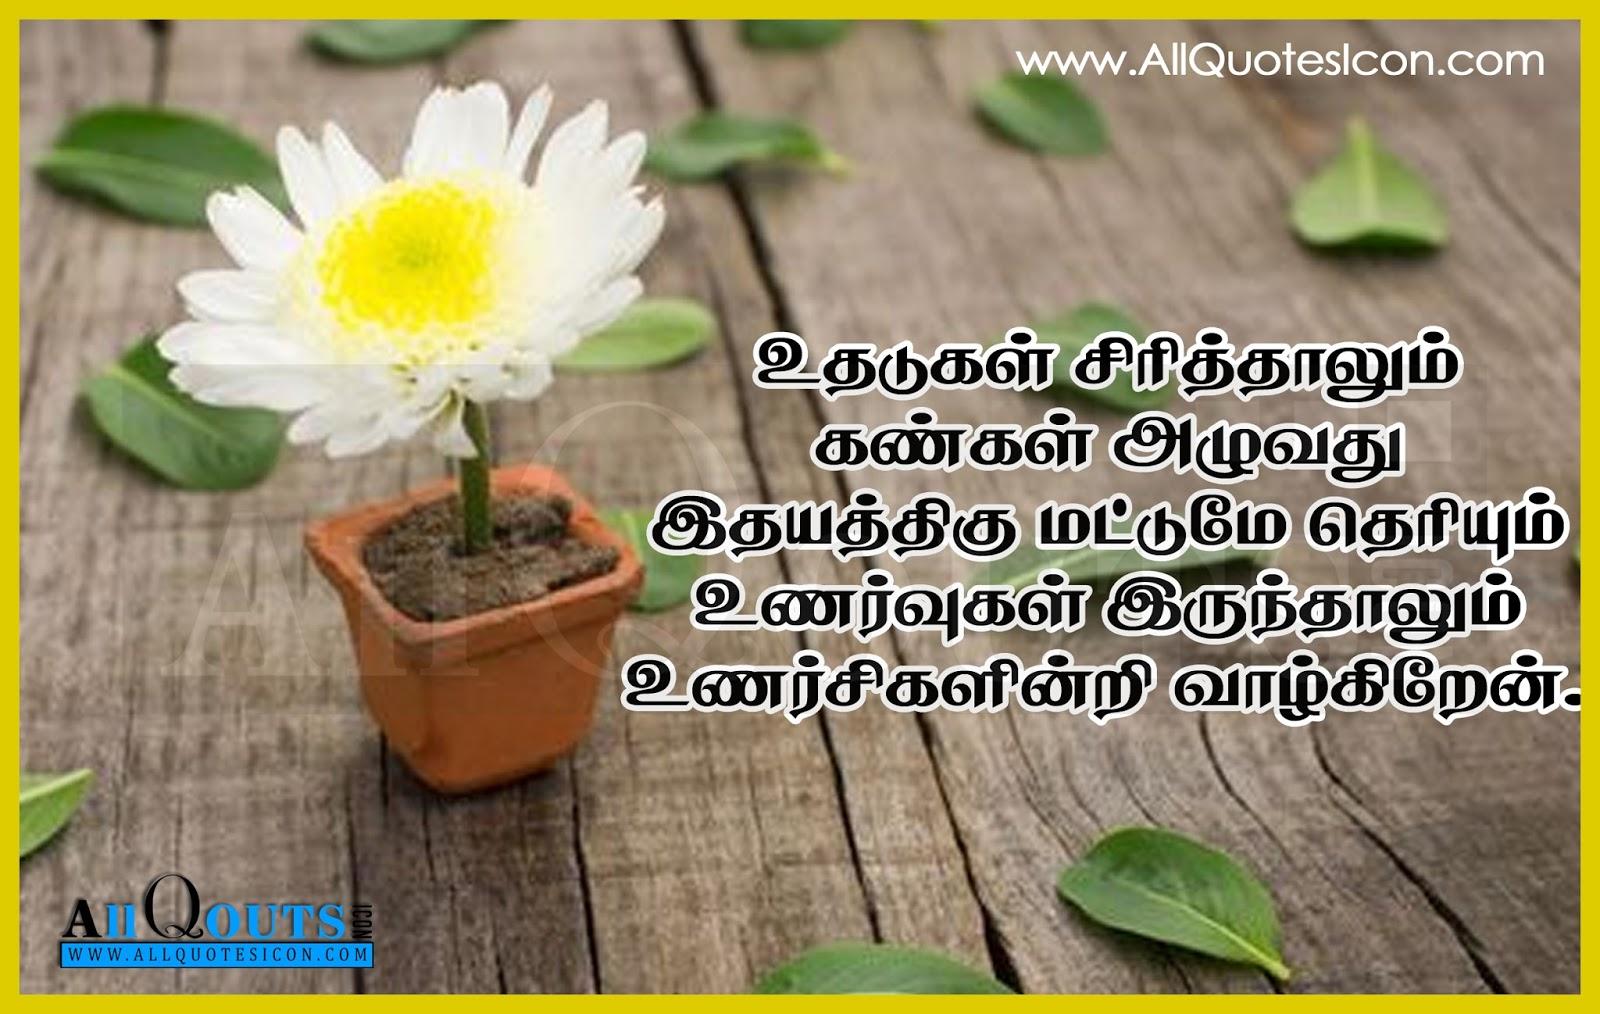 Best Tamil Quotes And Images Www Allquotesicon Com Telugu Quotes